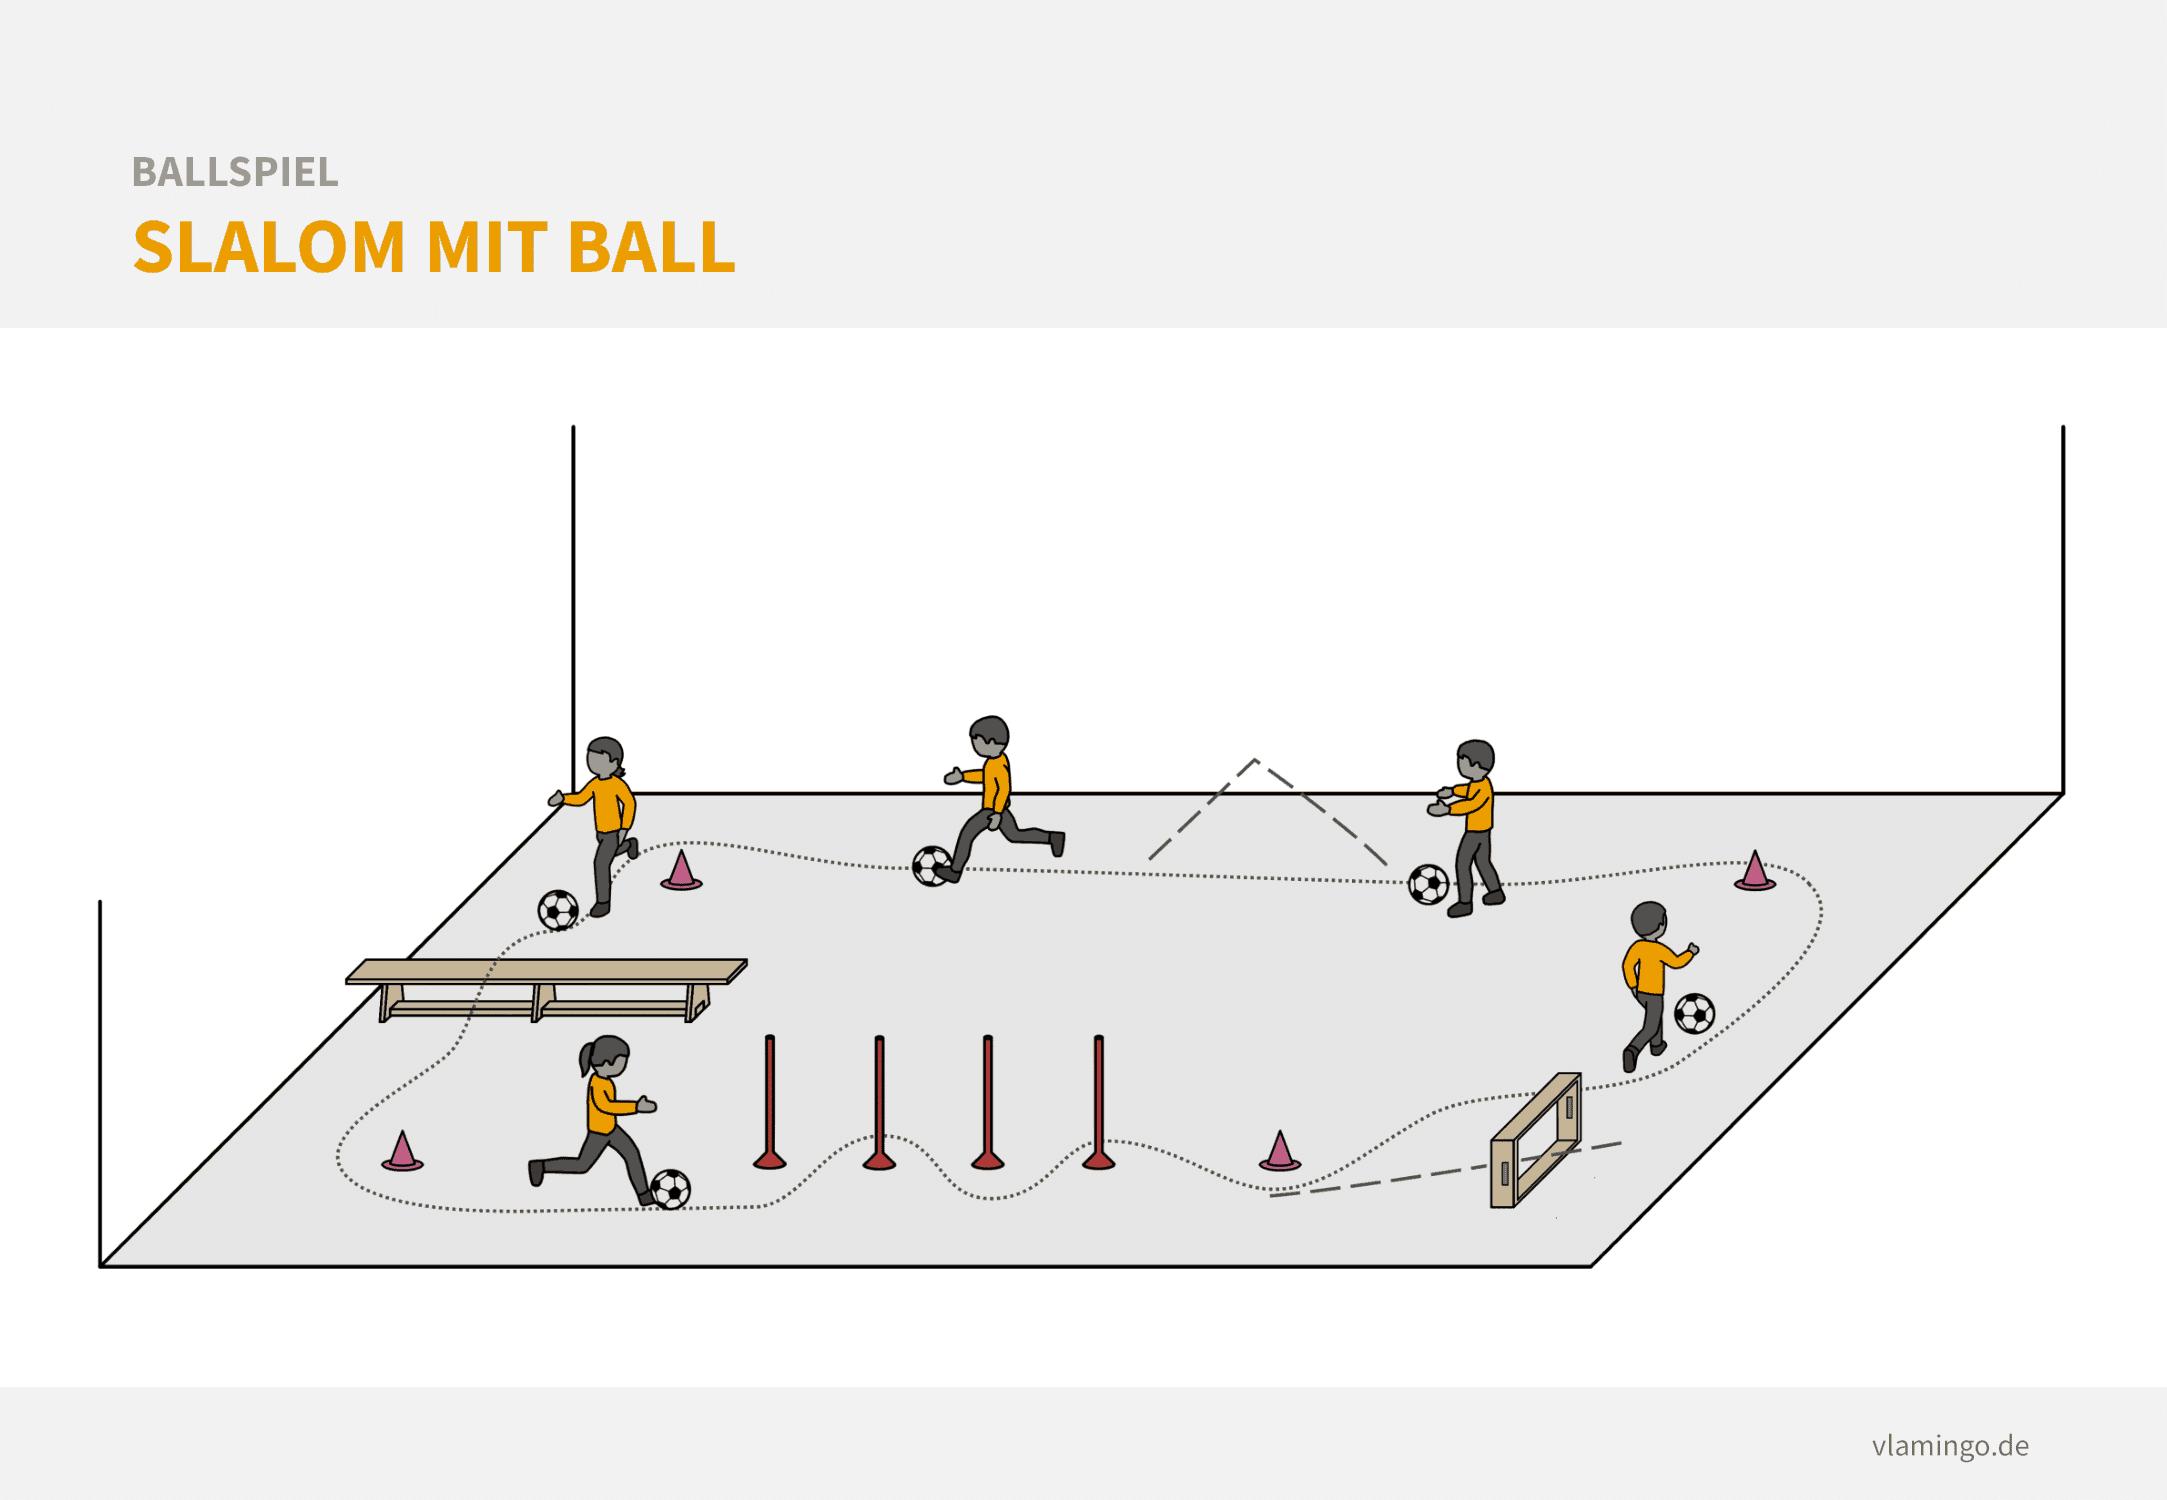 Fußball Aufwärmen: Slalom mit Ball